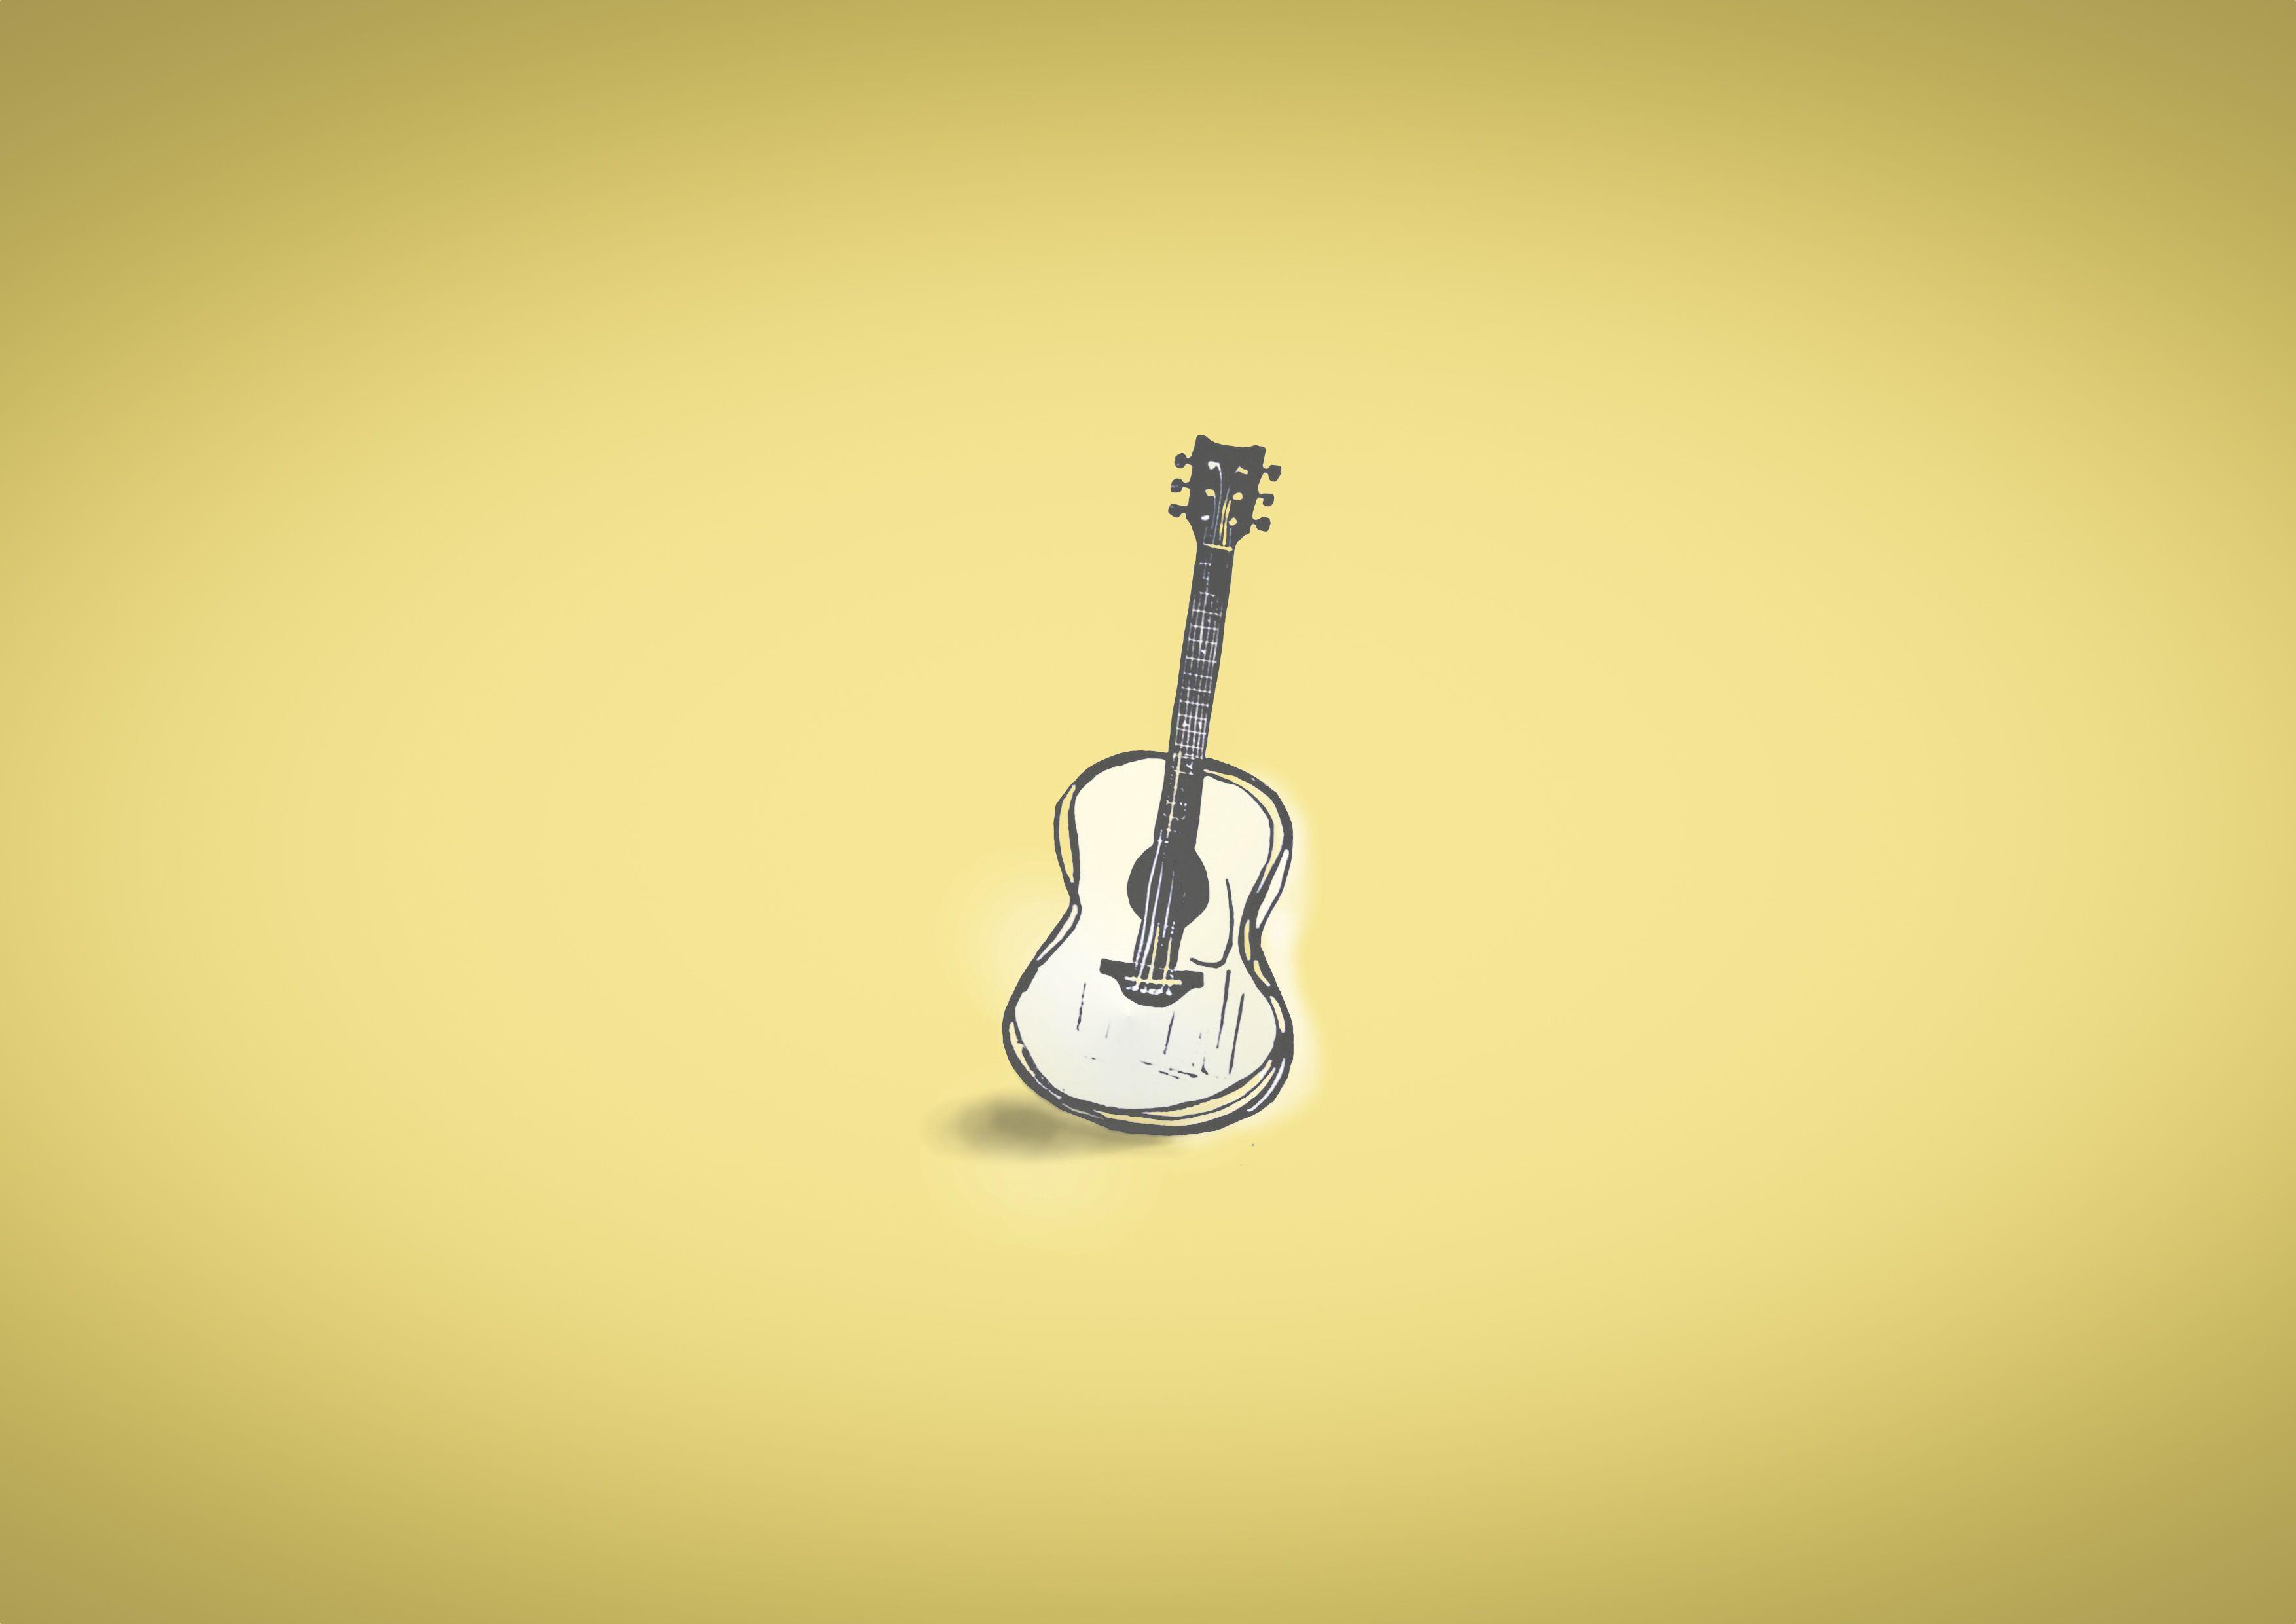 Prime Wallpaper Guitar Wall Digital Photo | Best Wallpaper HD